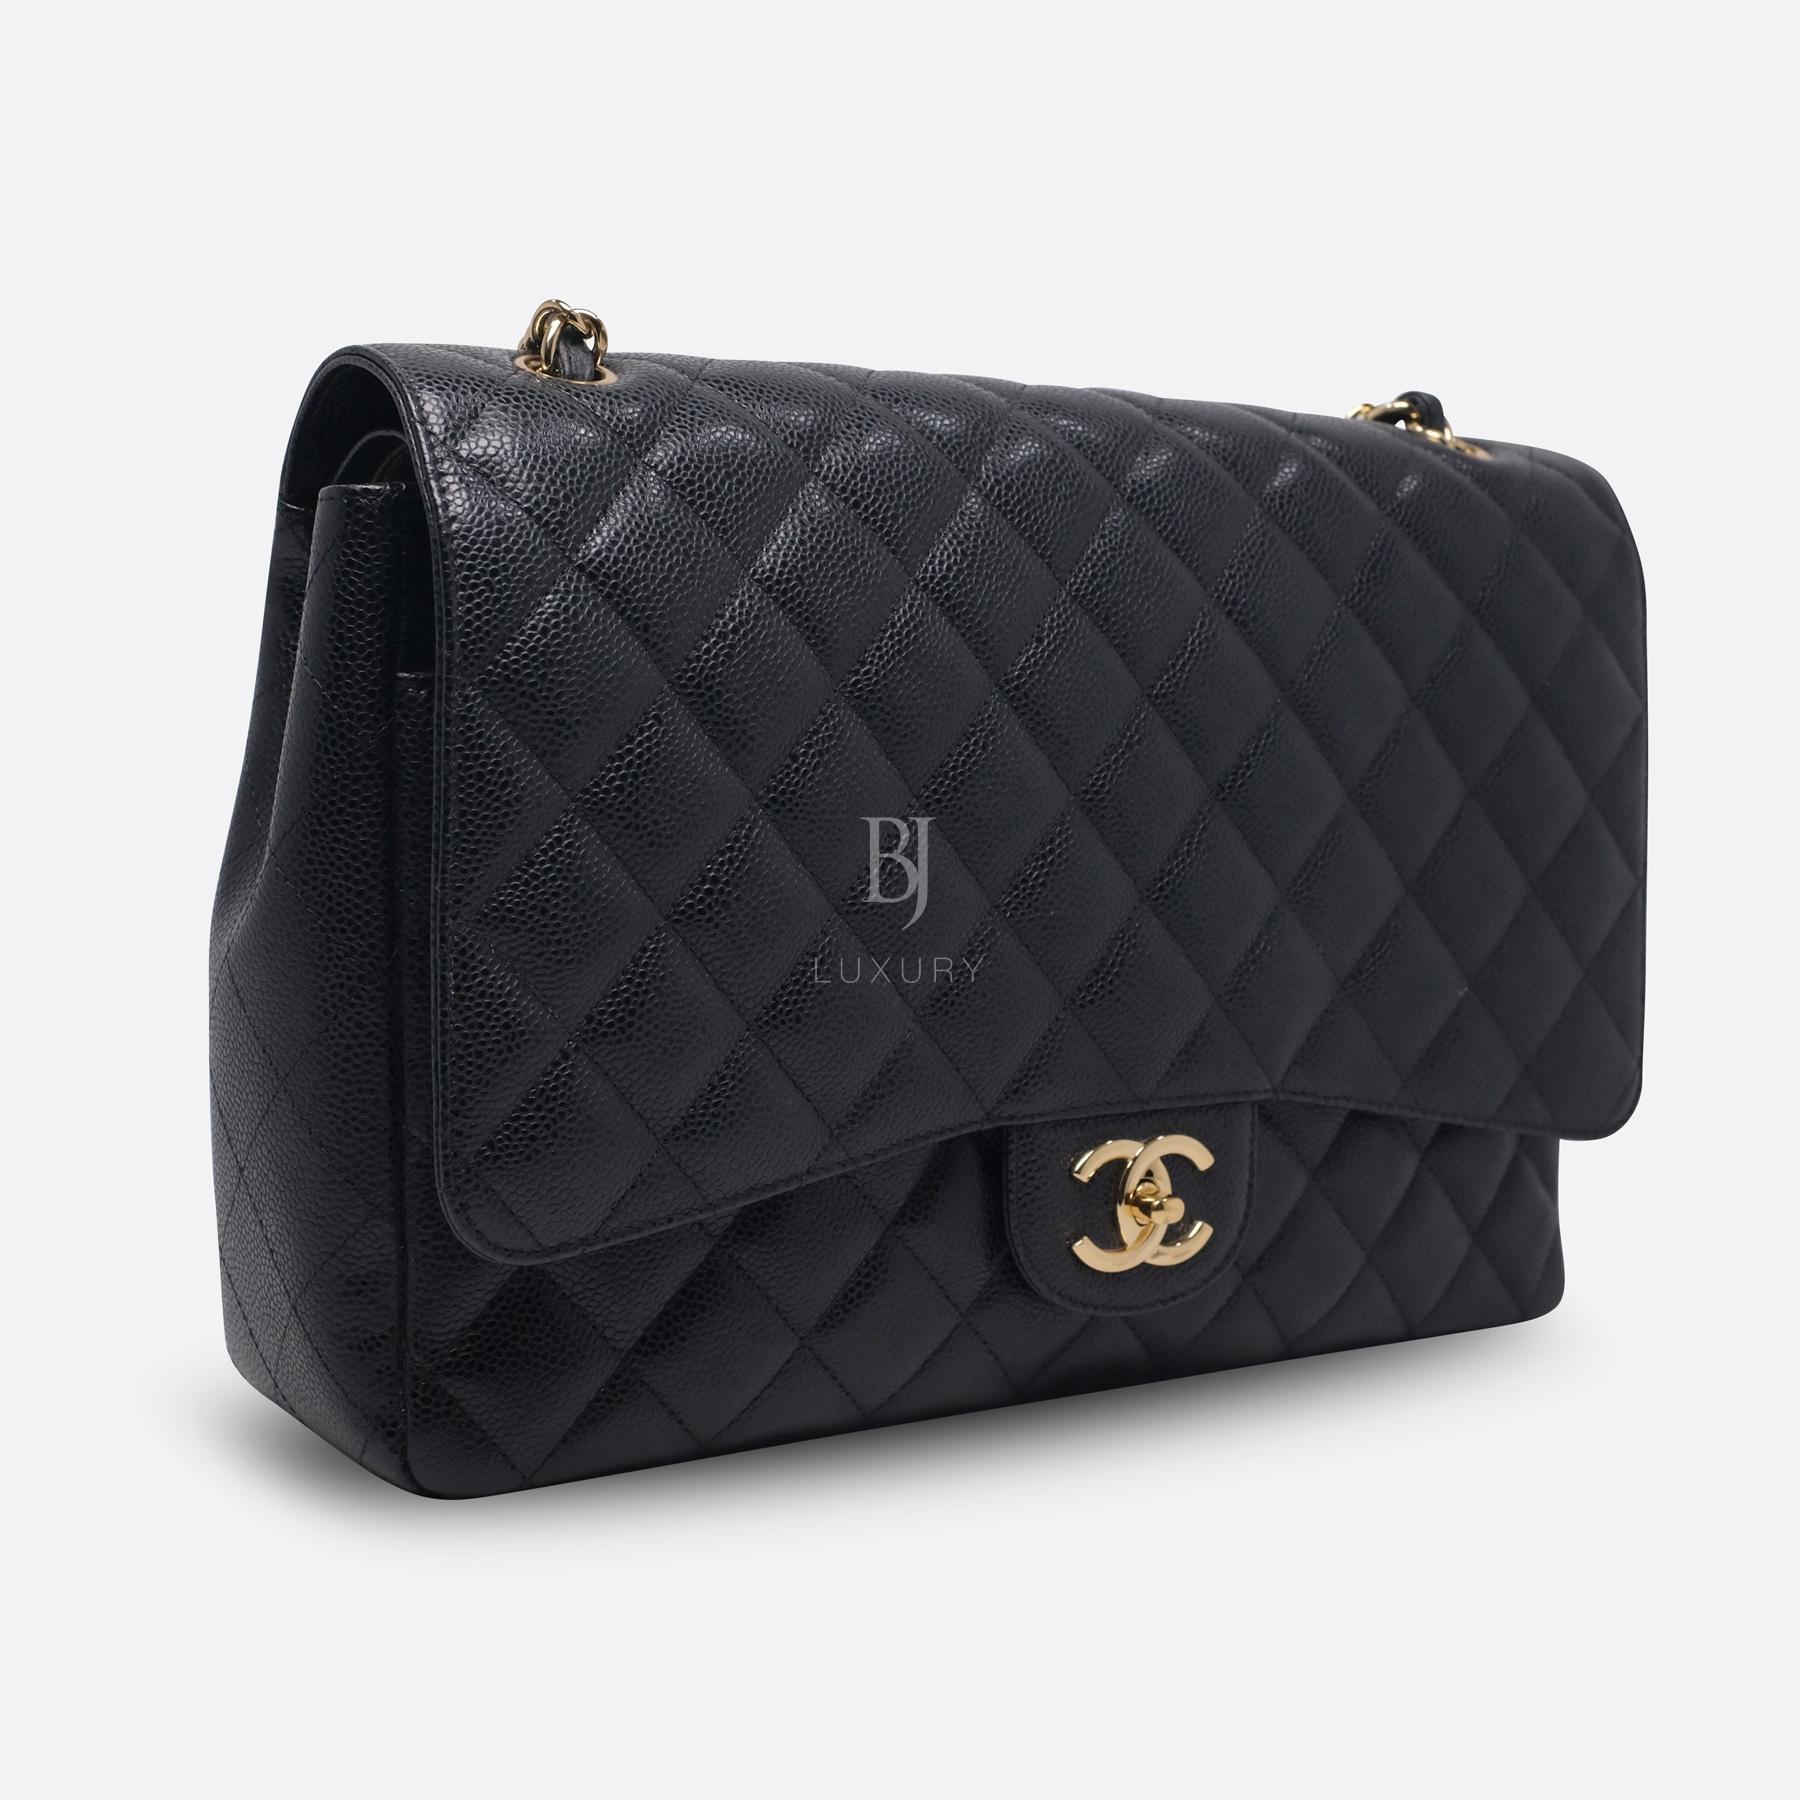 Chanel Classic Handbag Caviar Maxi Black BJ Luxury 3.jpg